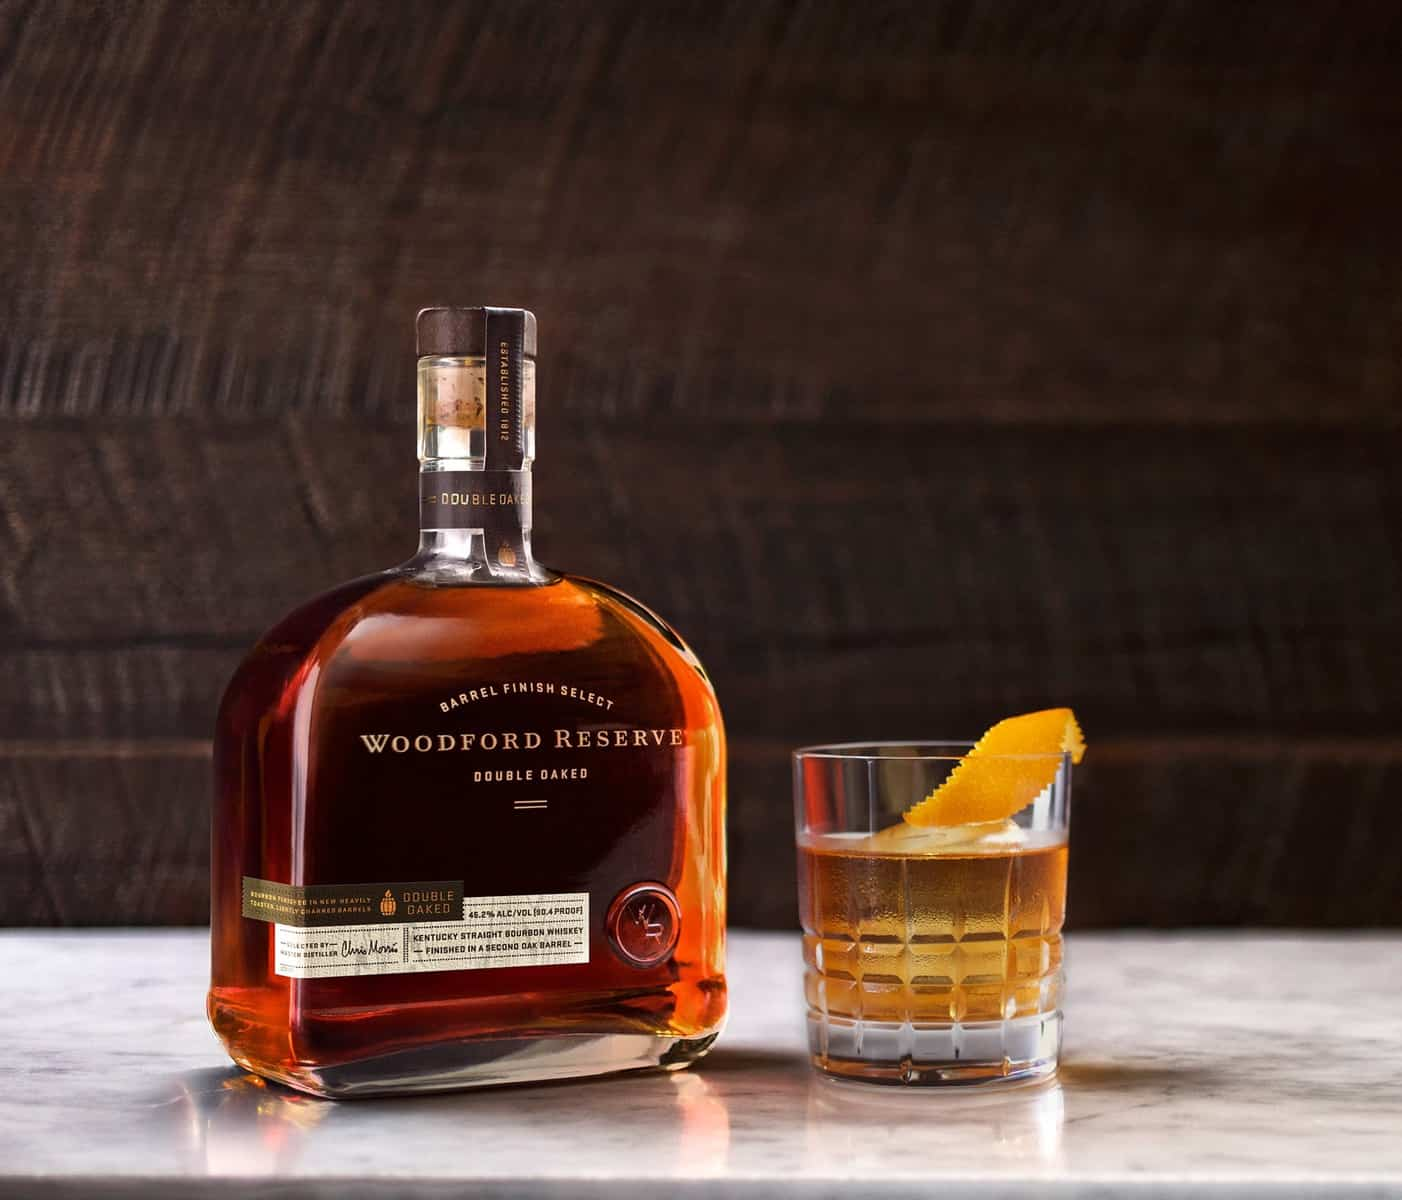 Top Shelf Bourbons